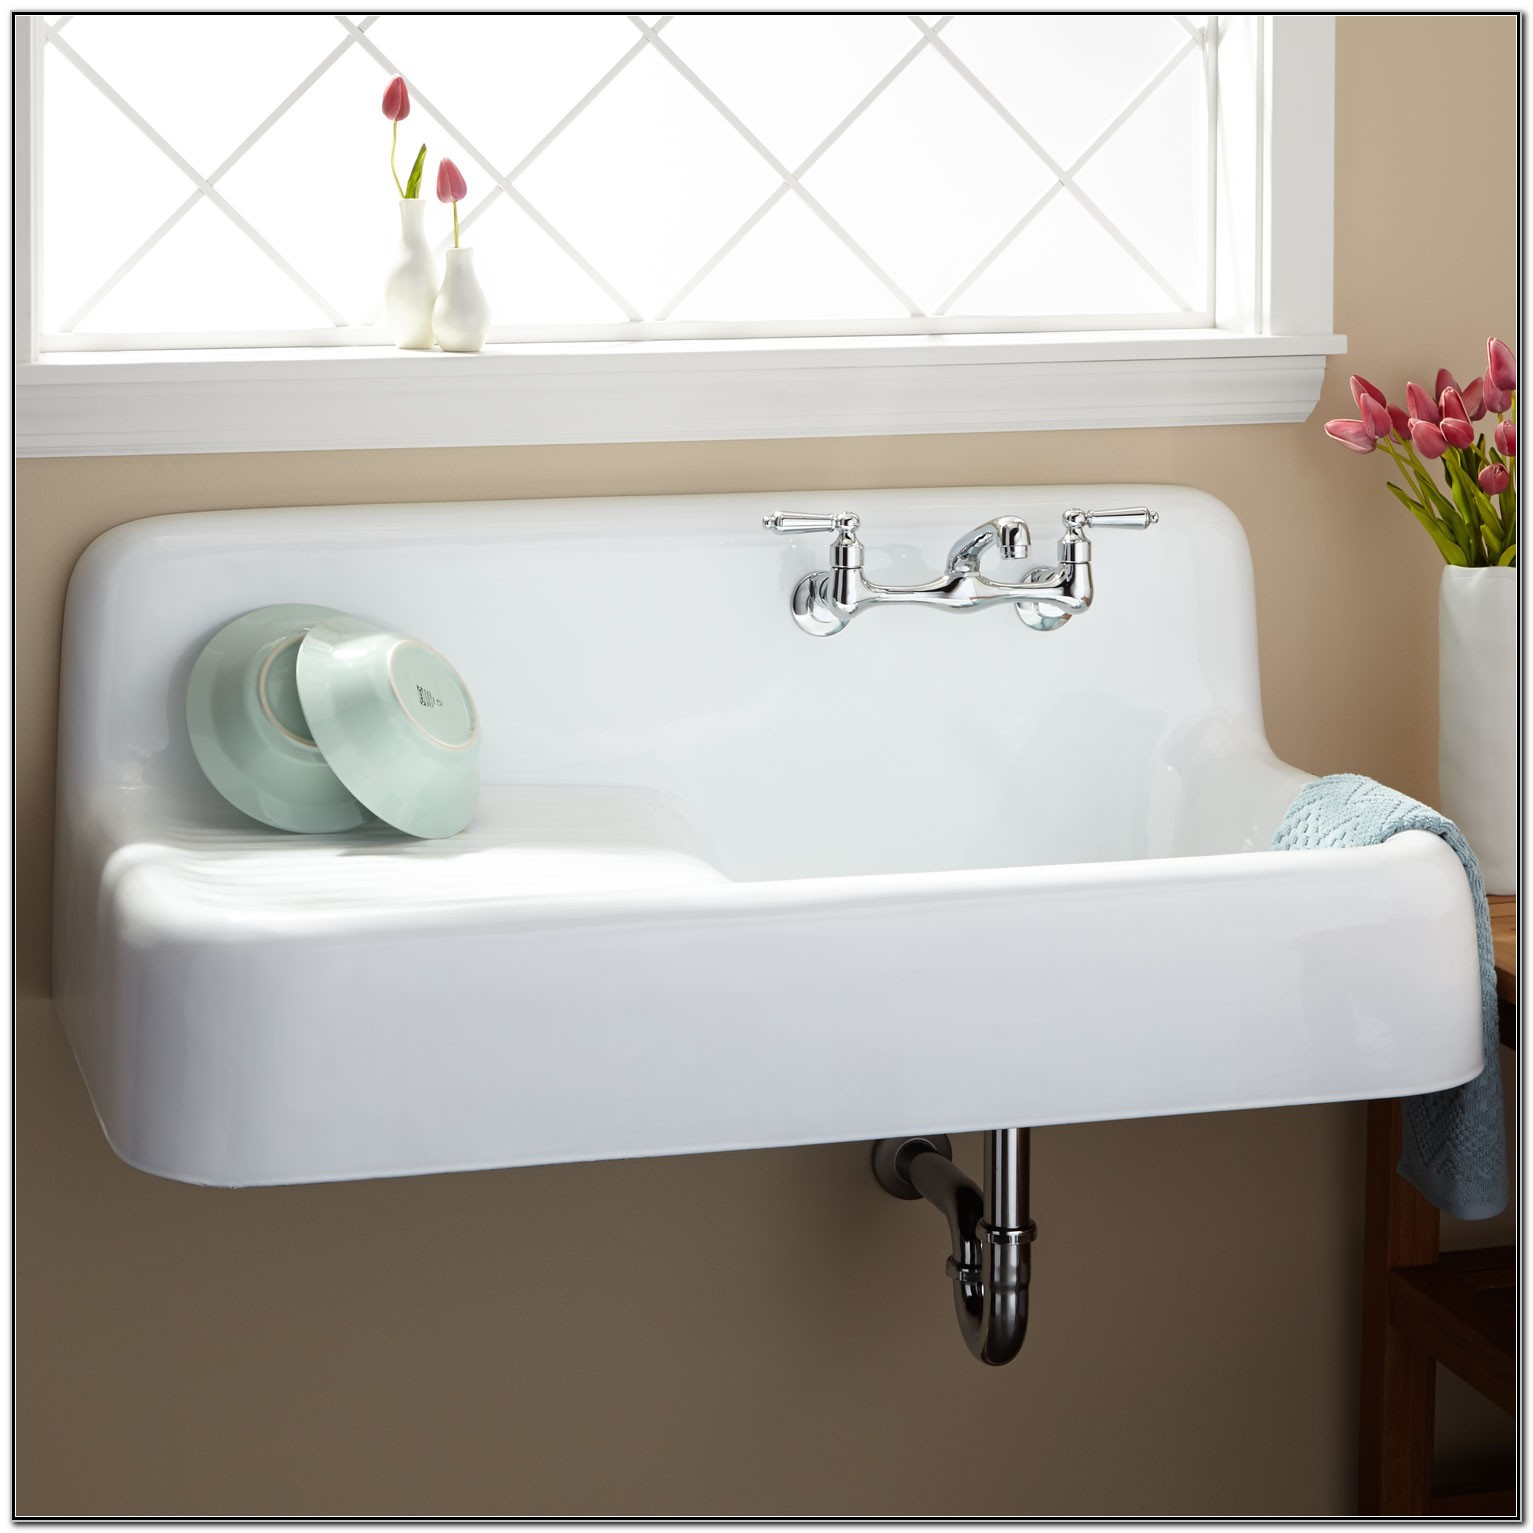 Kitchen Sink With Drainboard Cast Iron